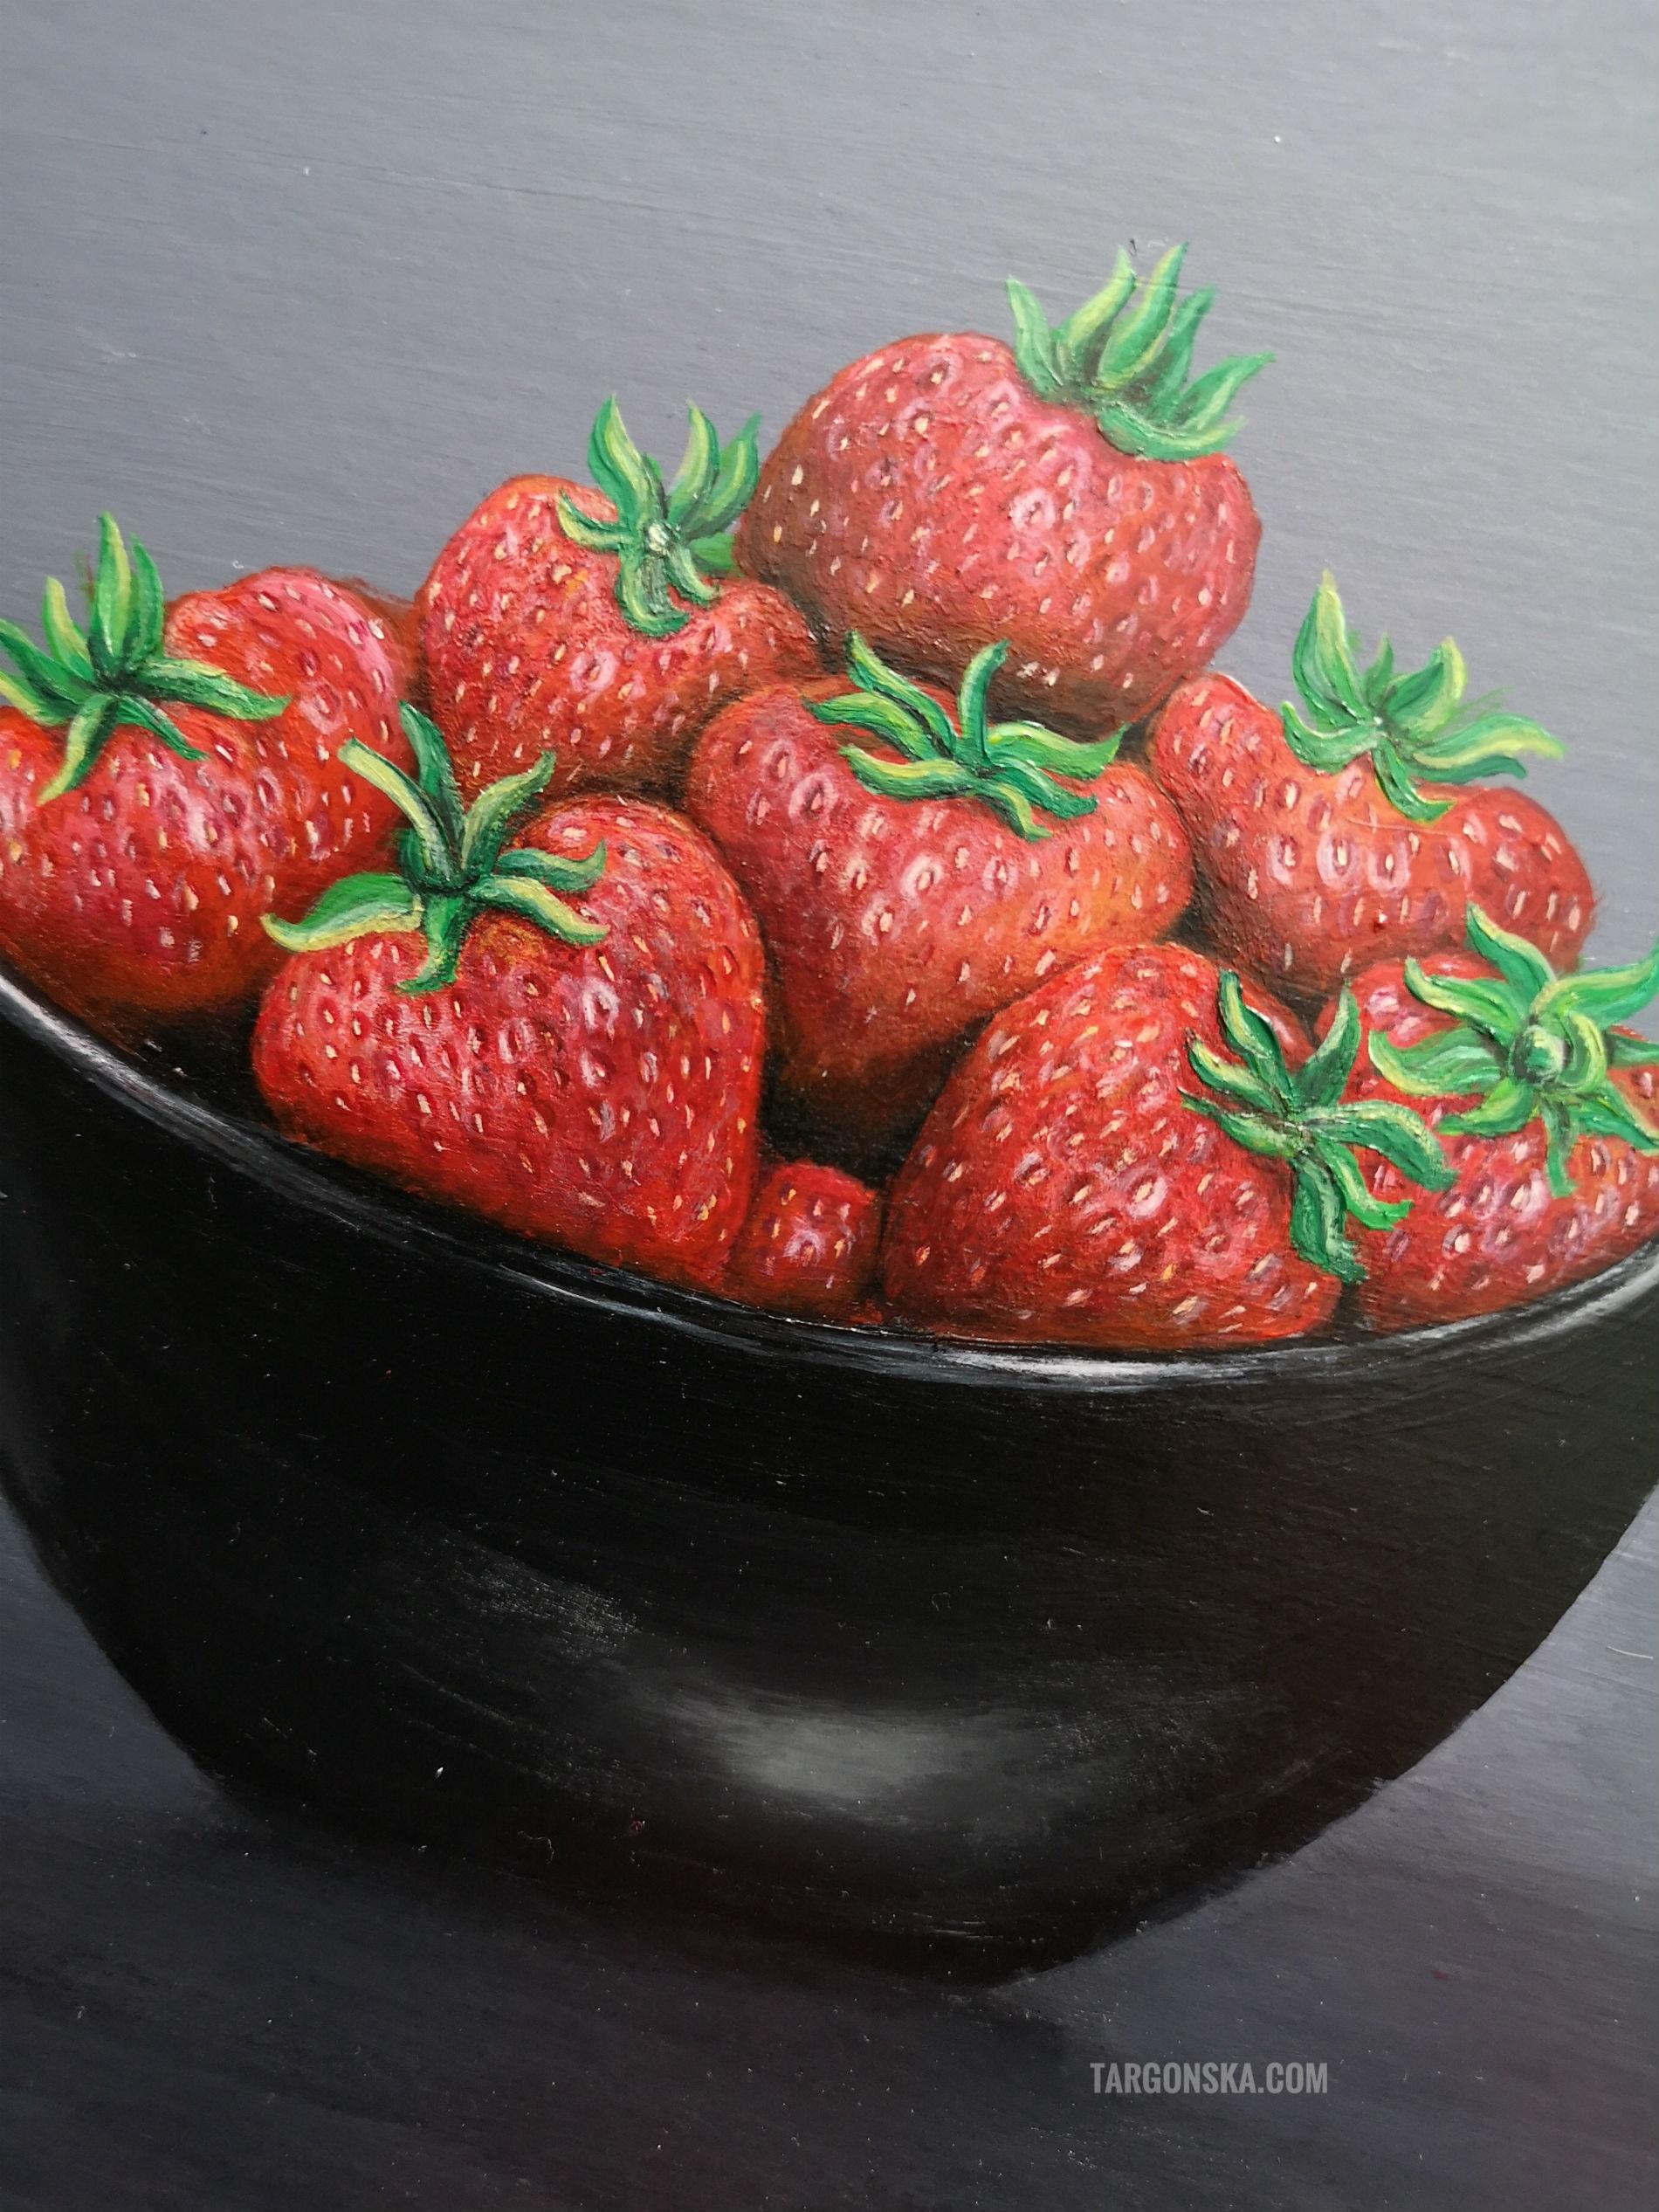 Bowl of strawberries targonska